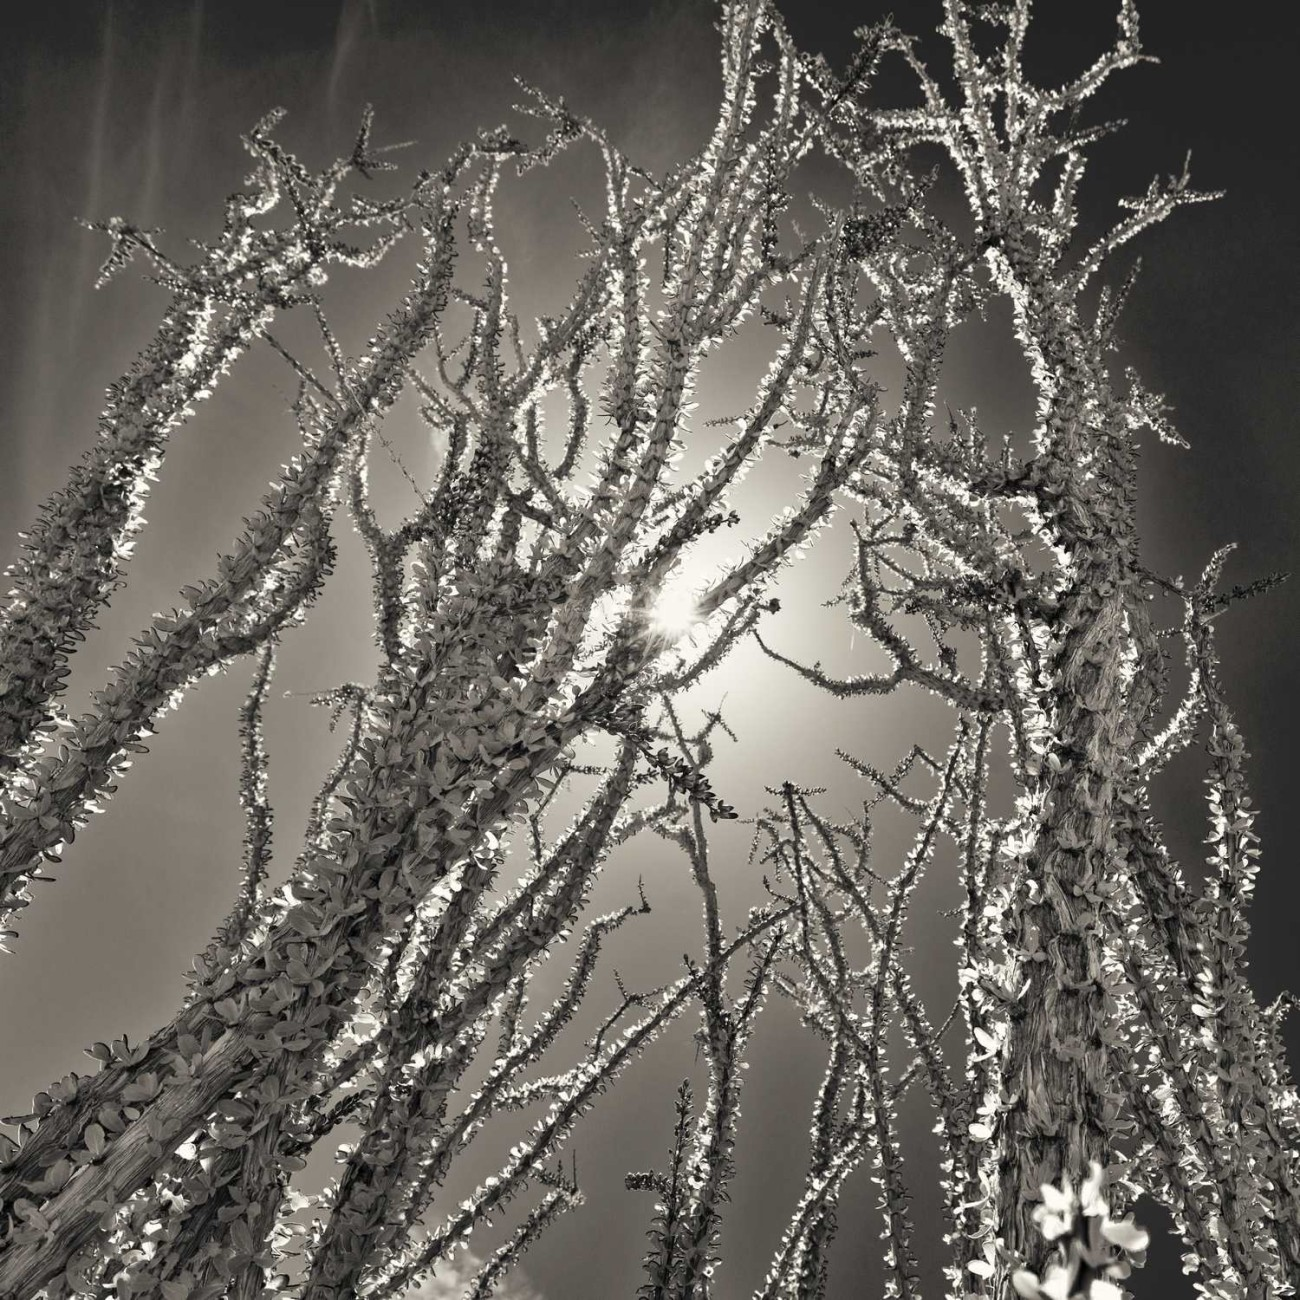 Ocotillo cactus and sun, Joshua Tree NP, CA, 2012